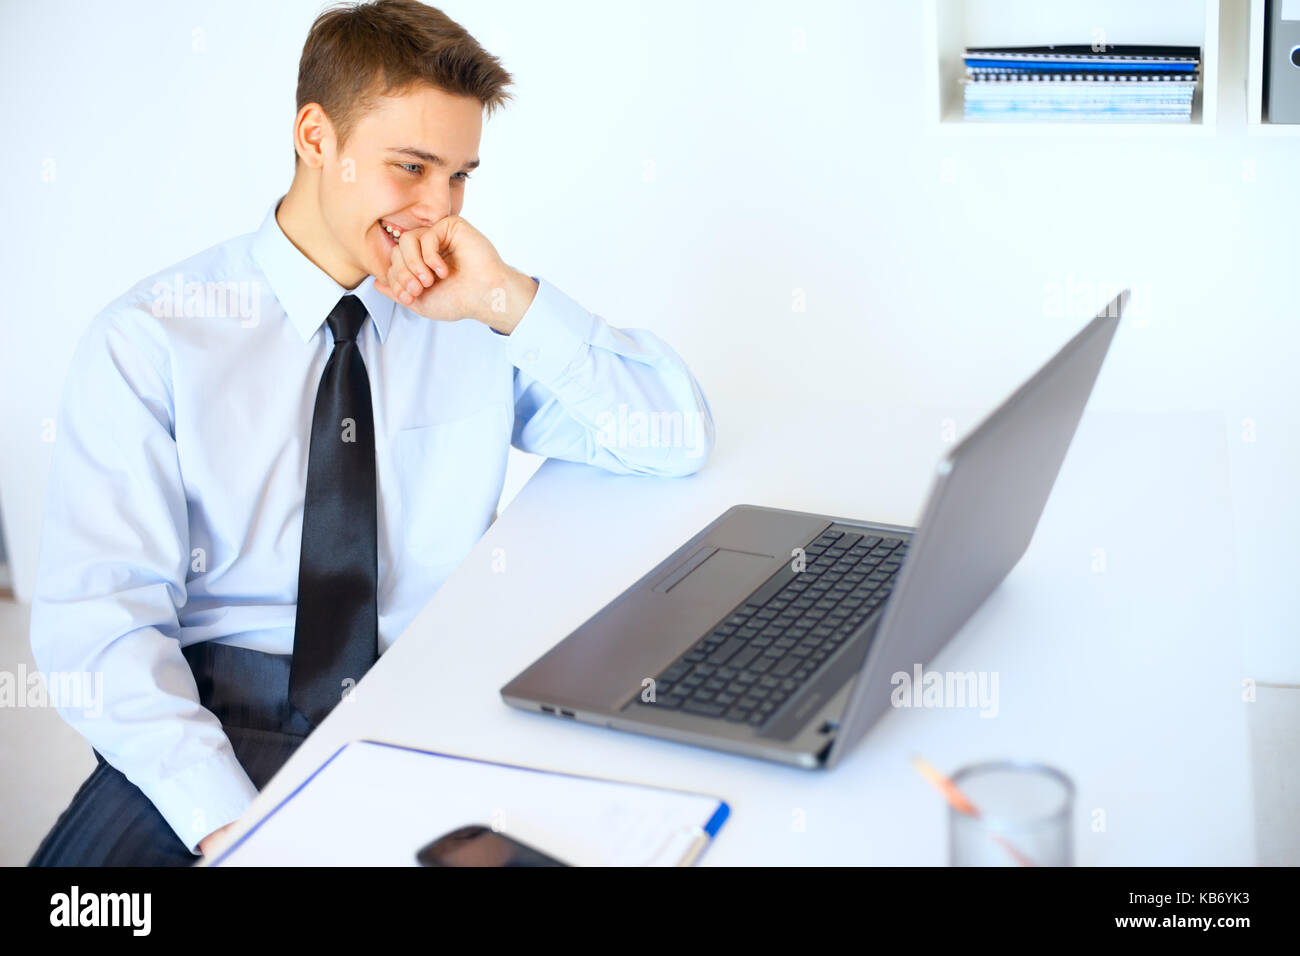 Porträt der jungen Lachen Geschäftsmann auf dem Laptop-bildschirm an seinem Arbeitsplatz im hellen Büro Stockbild